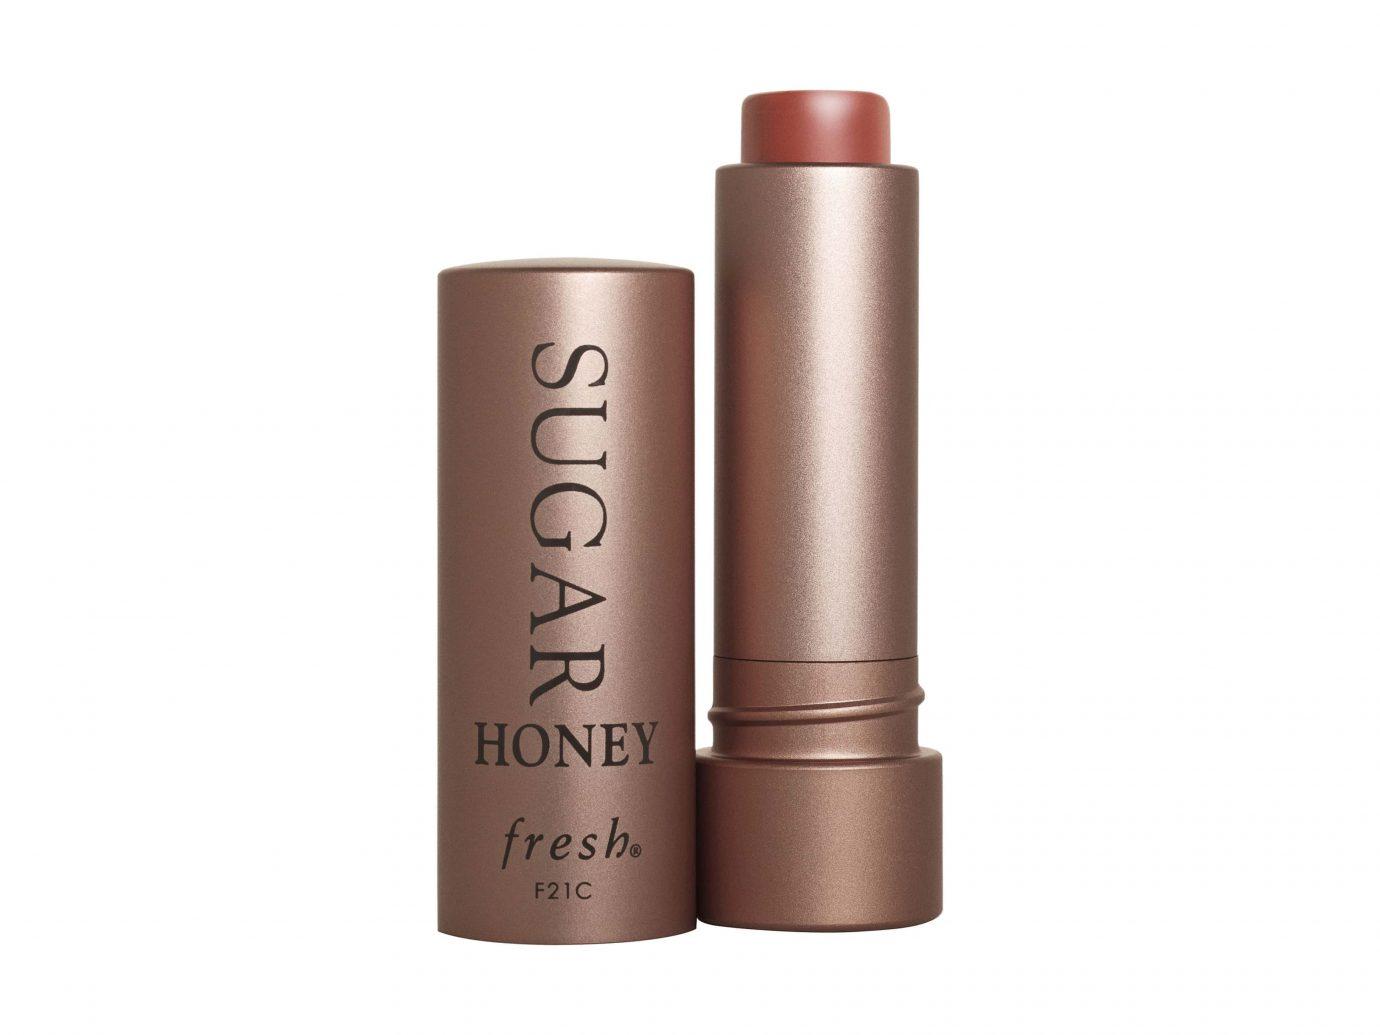 Sugar Tinted Lip Treatment SPF 15 FRESH